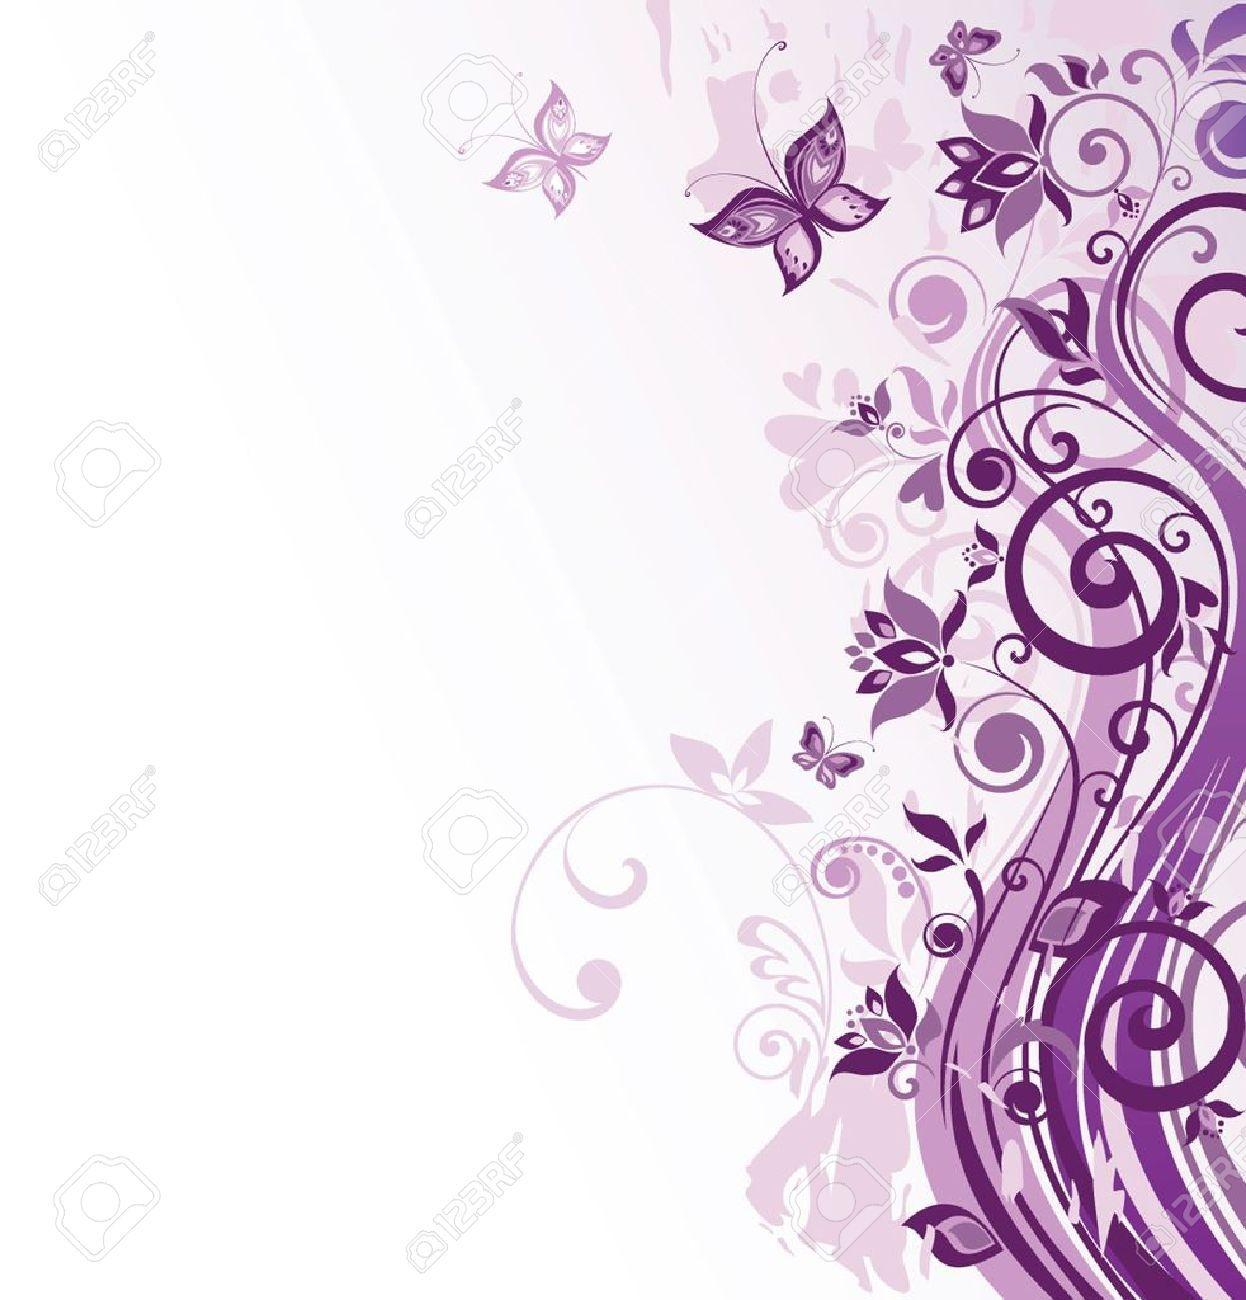 lavender background design - photo #35